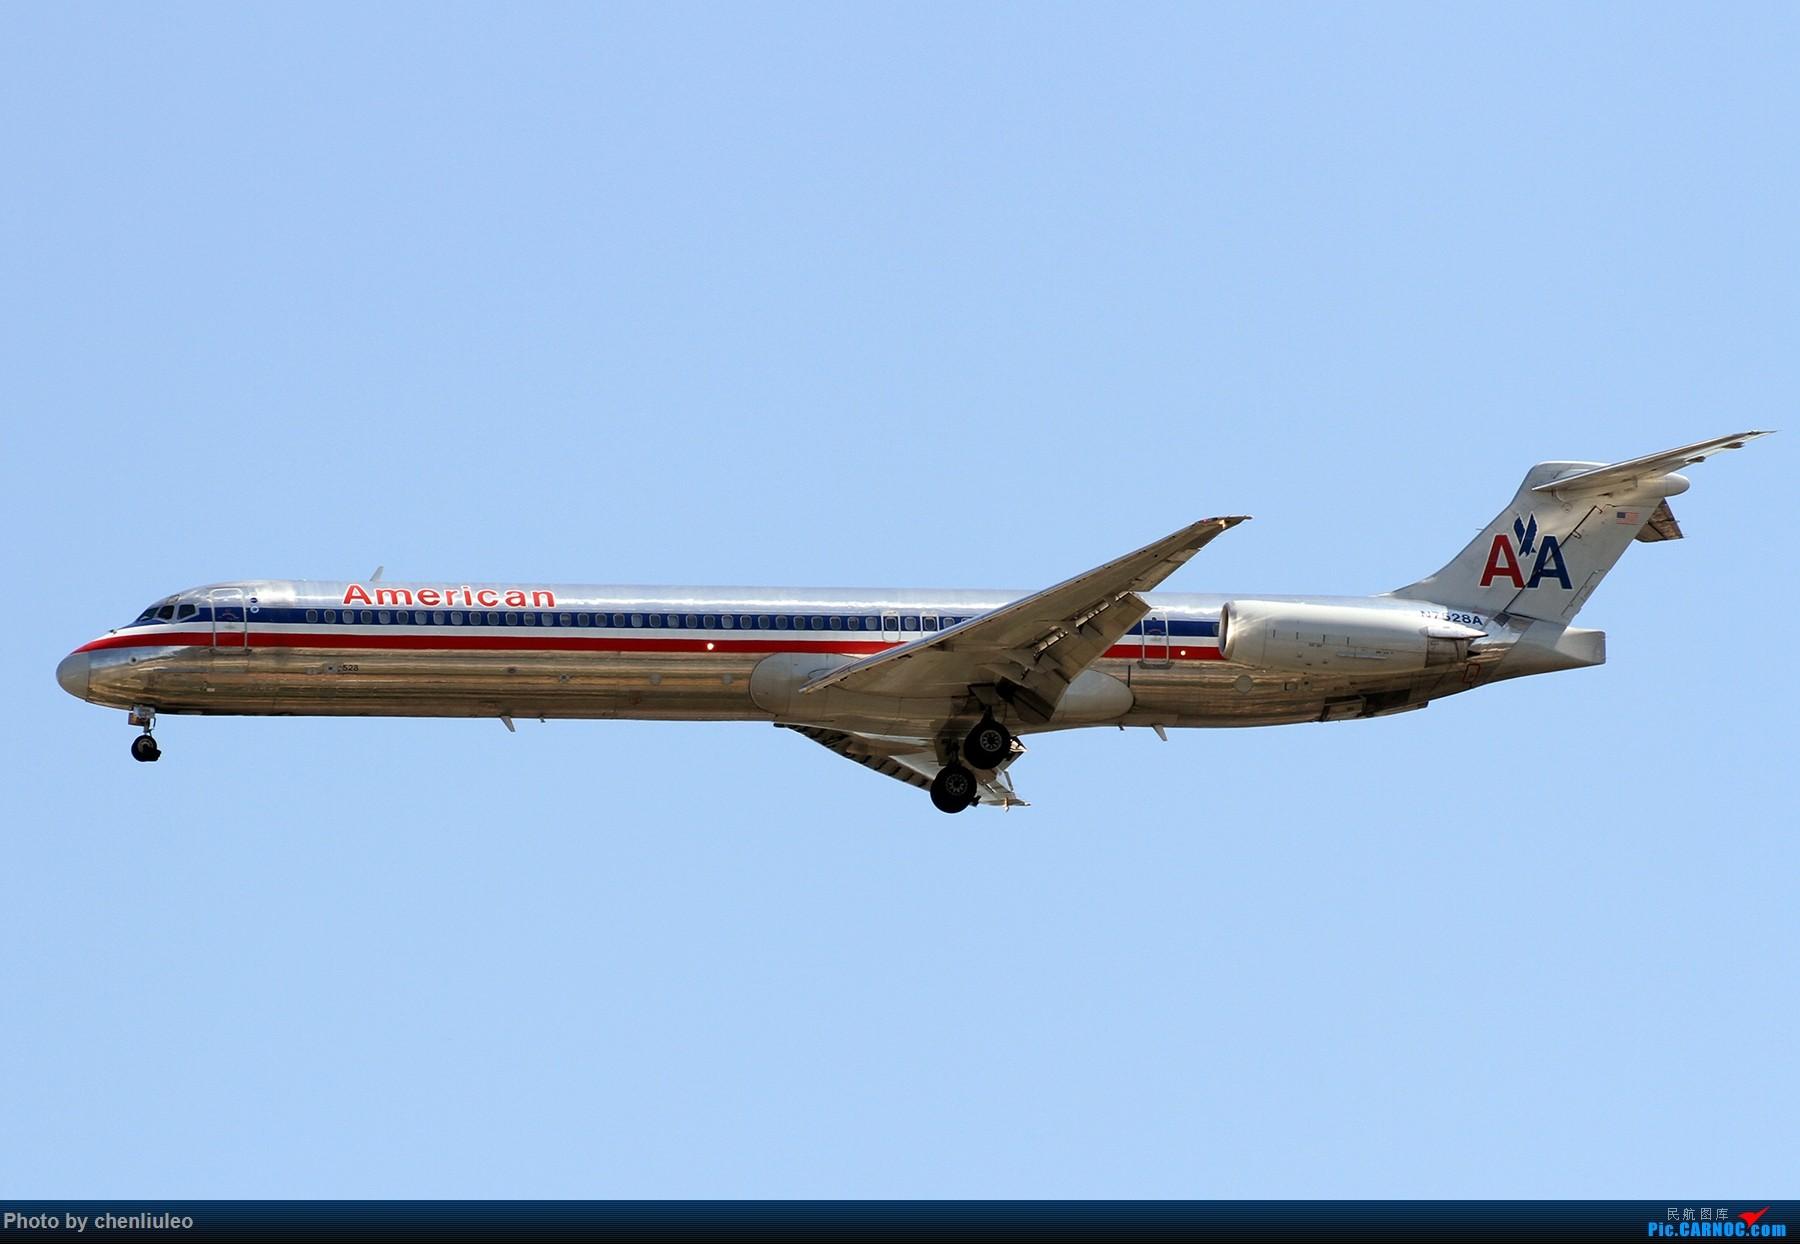 Re:[原创]【北美飞友会】本来是去等西南航空的新加州一号彩绘 结果有意外惊喜 美军C-40C MD MD-80-82 N7528A 美国圣路易斯机场